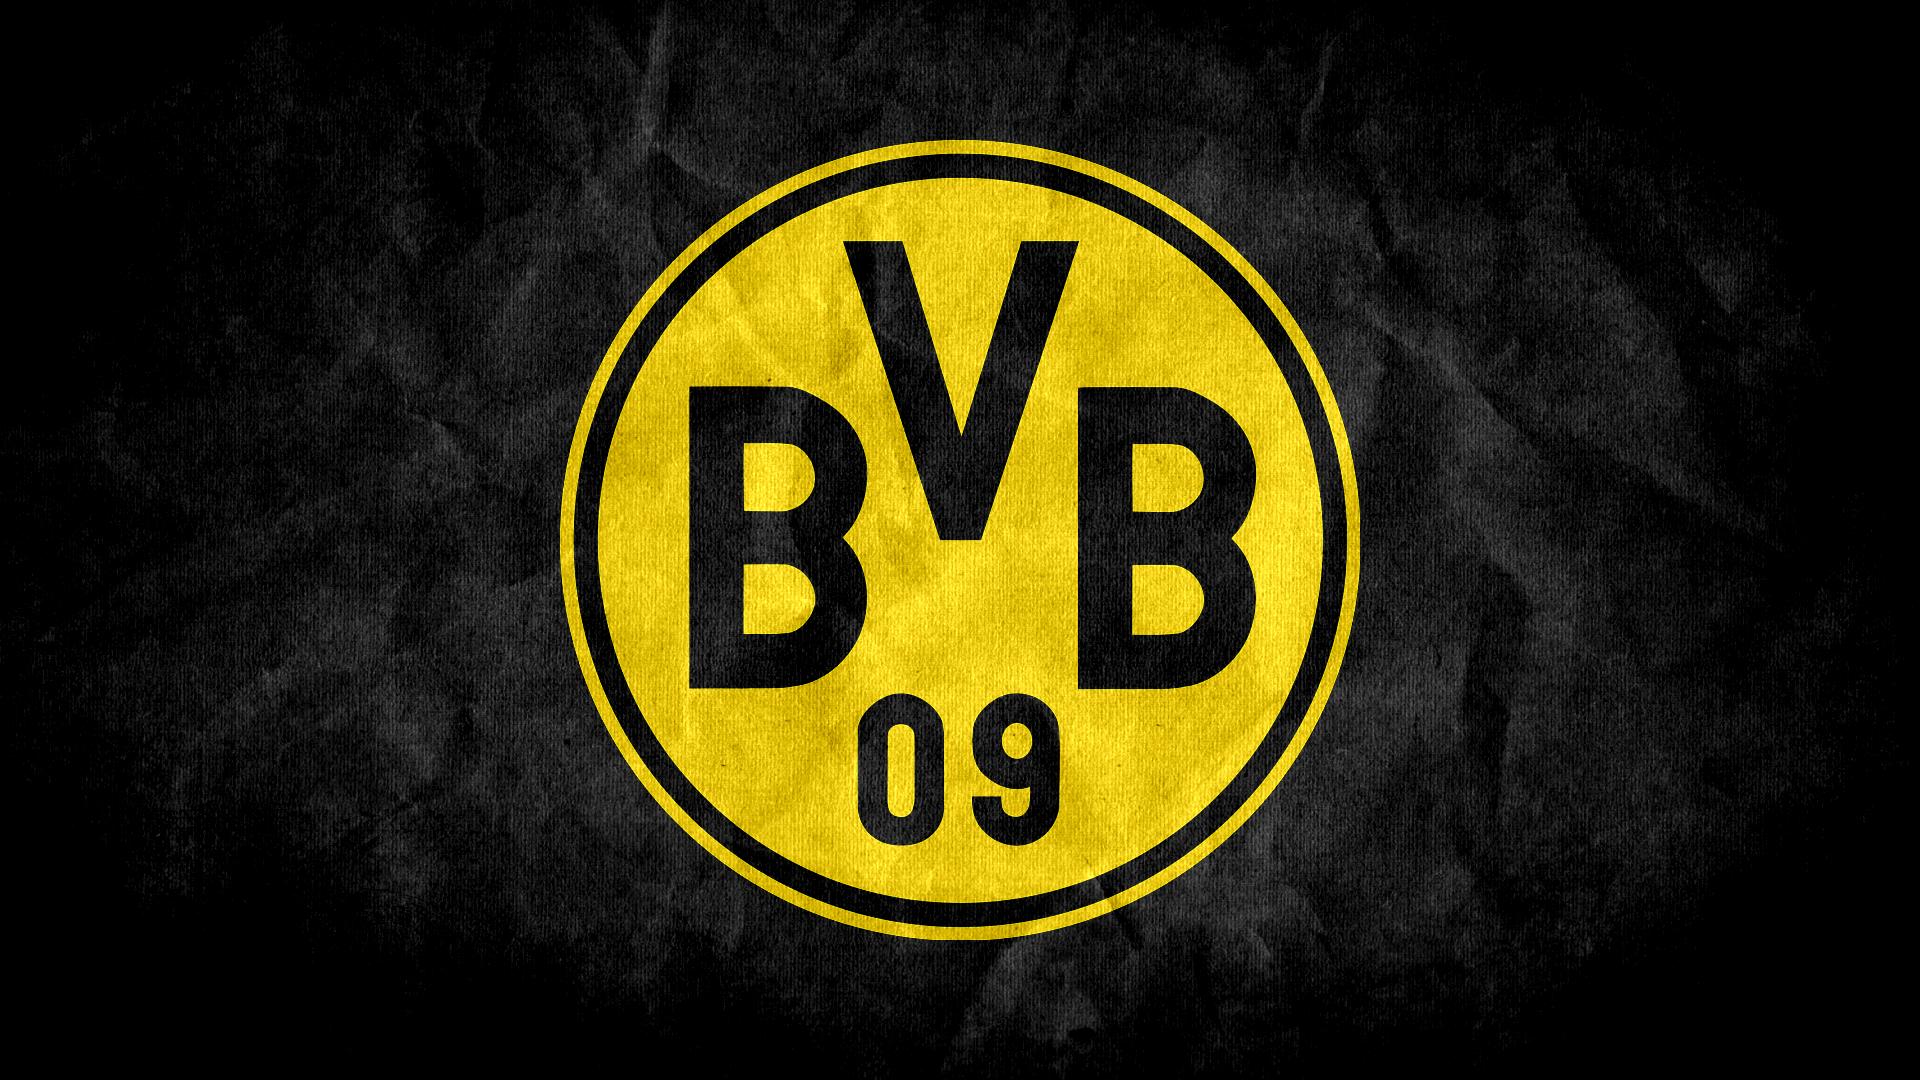 Borussia Dortmund'a Geçmiş Olsun Mesajı